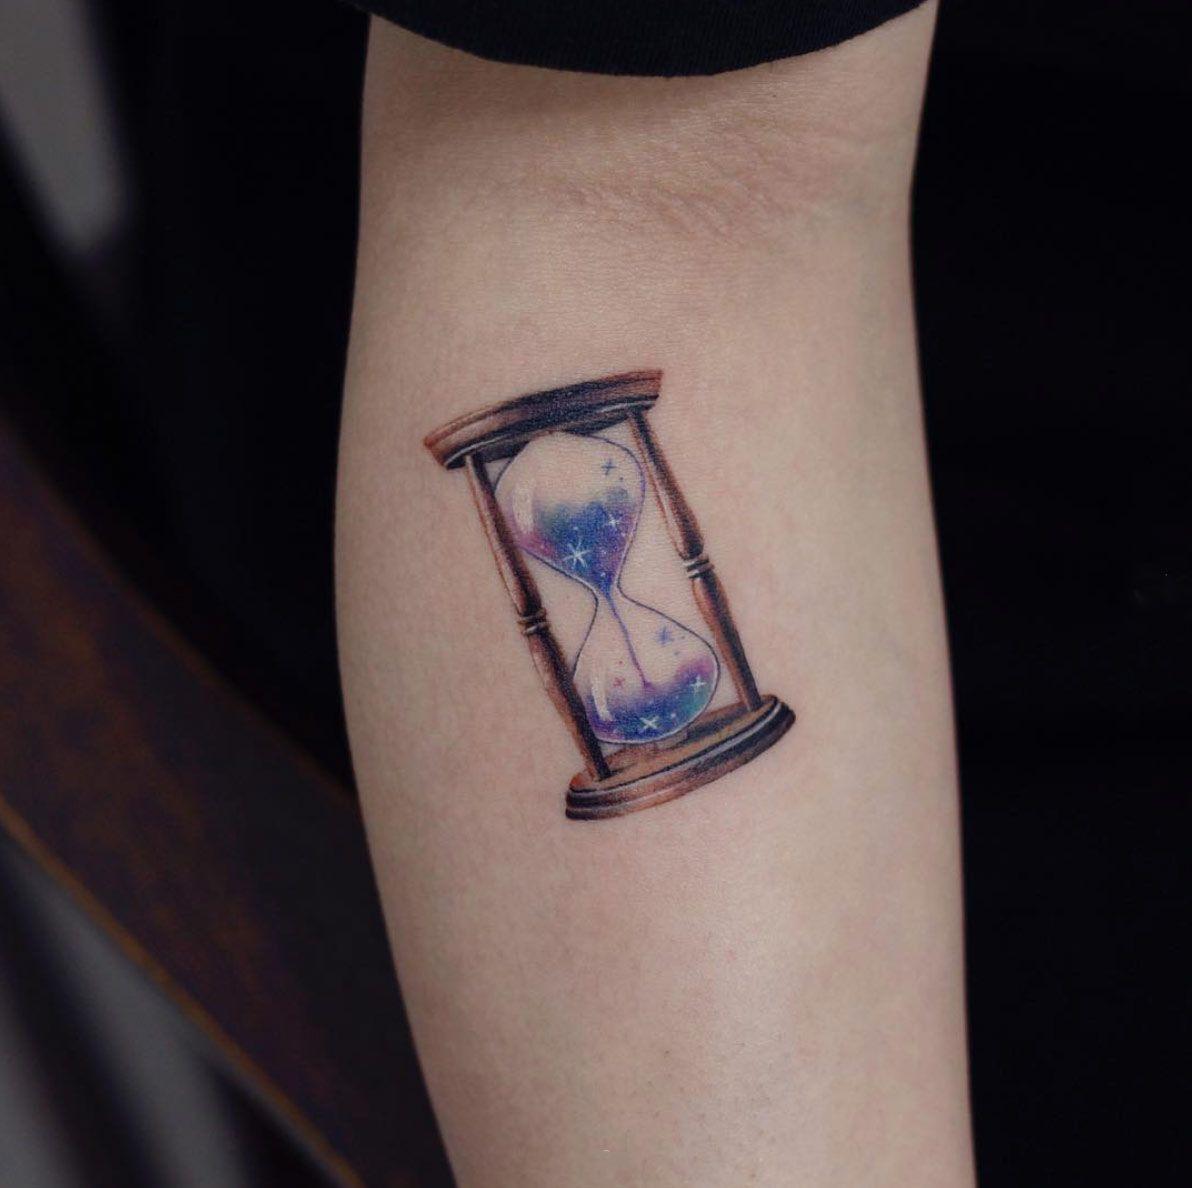 An Hourglass By Saegeem Geometric Tattoo Tattoos Geometric Shape Tattoo